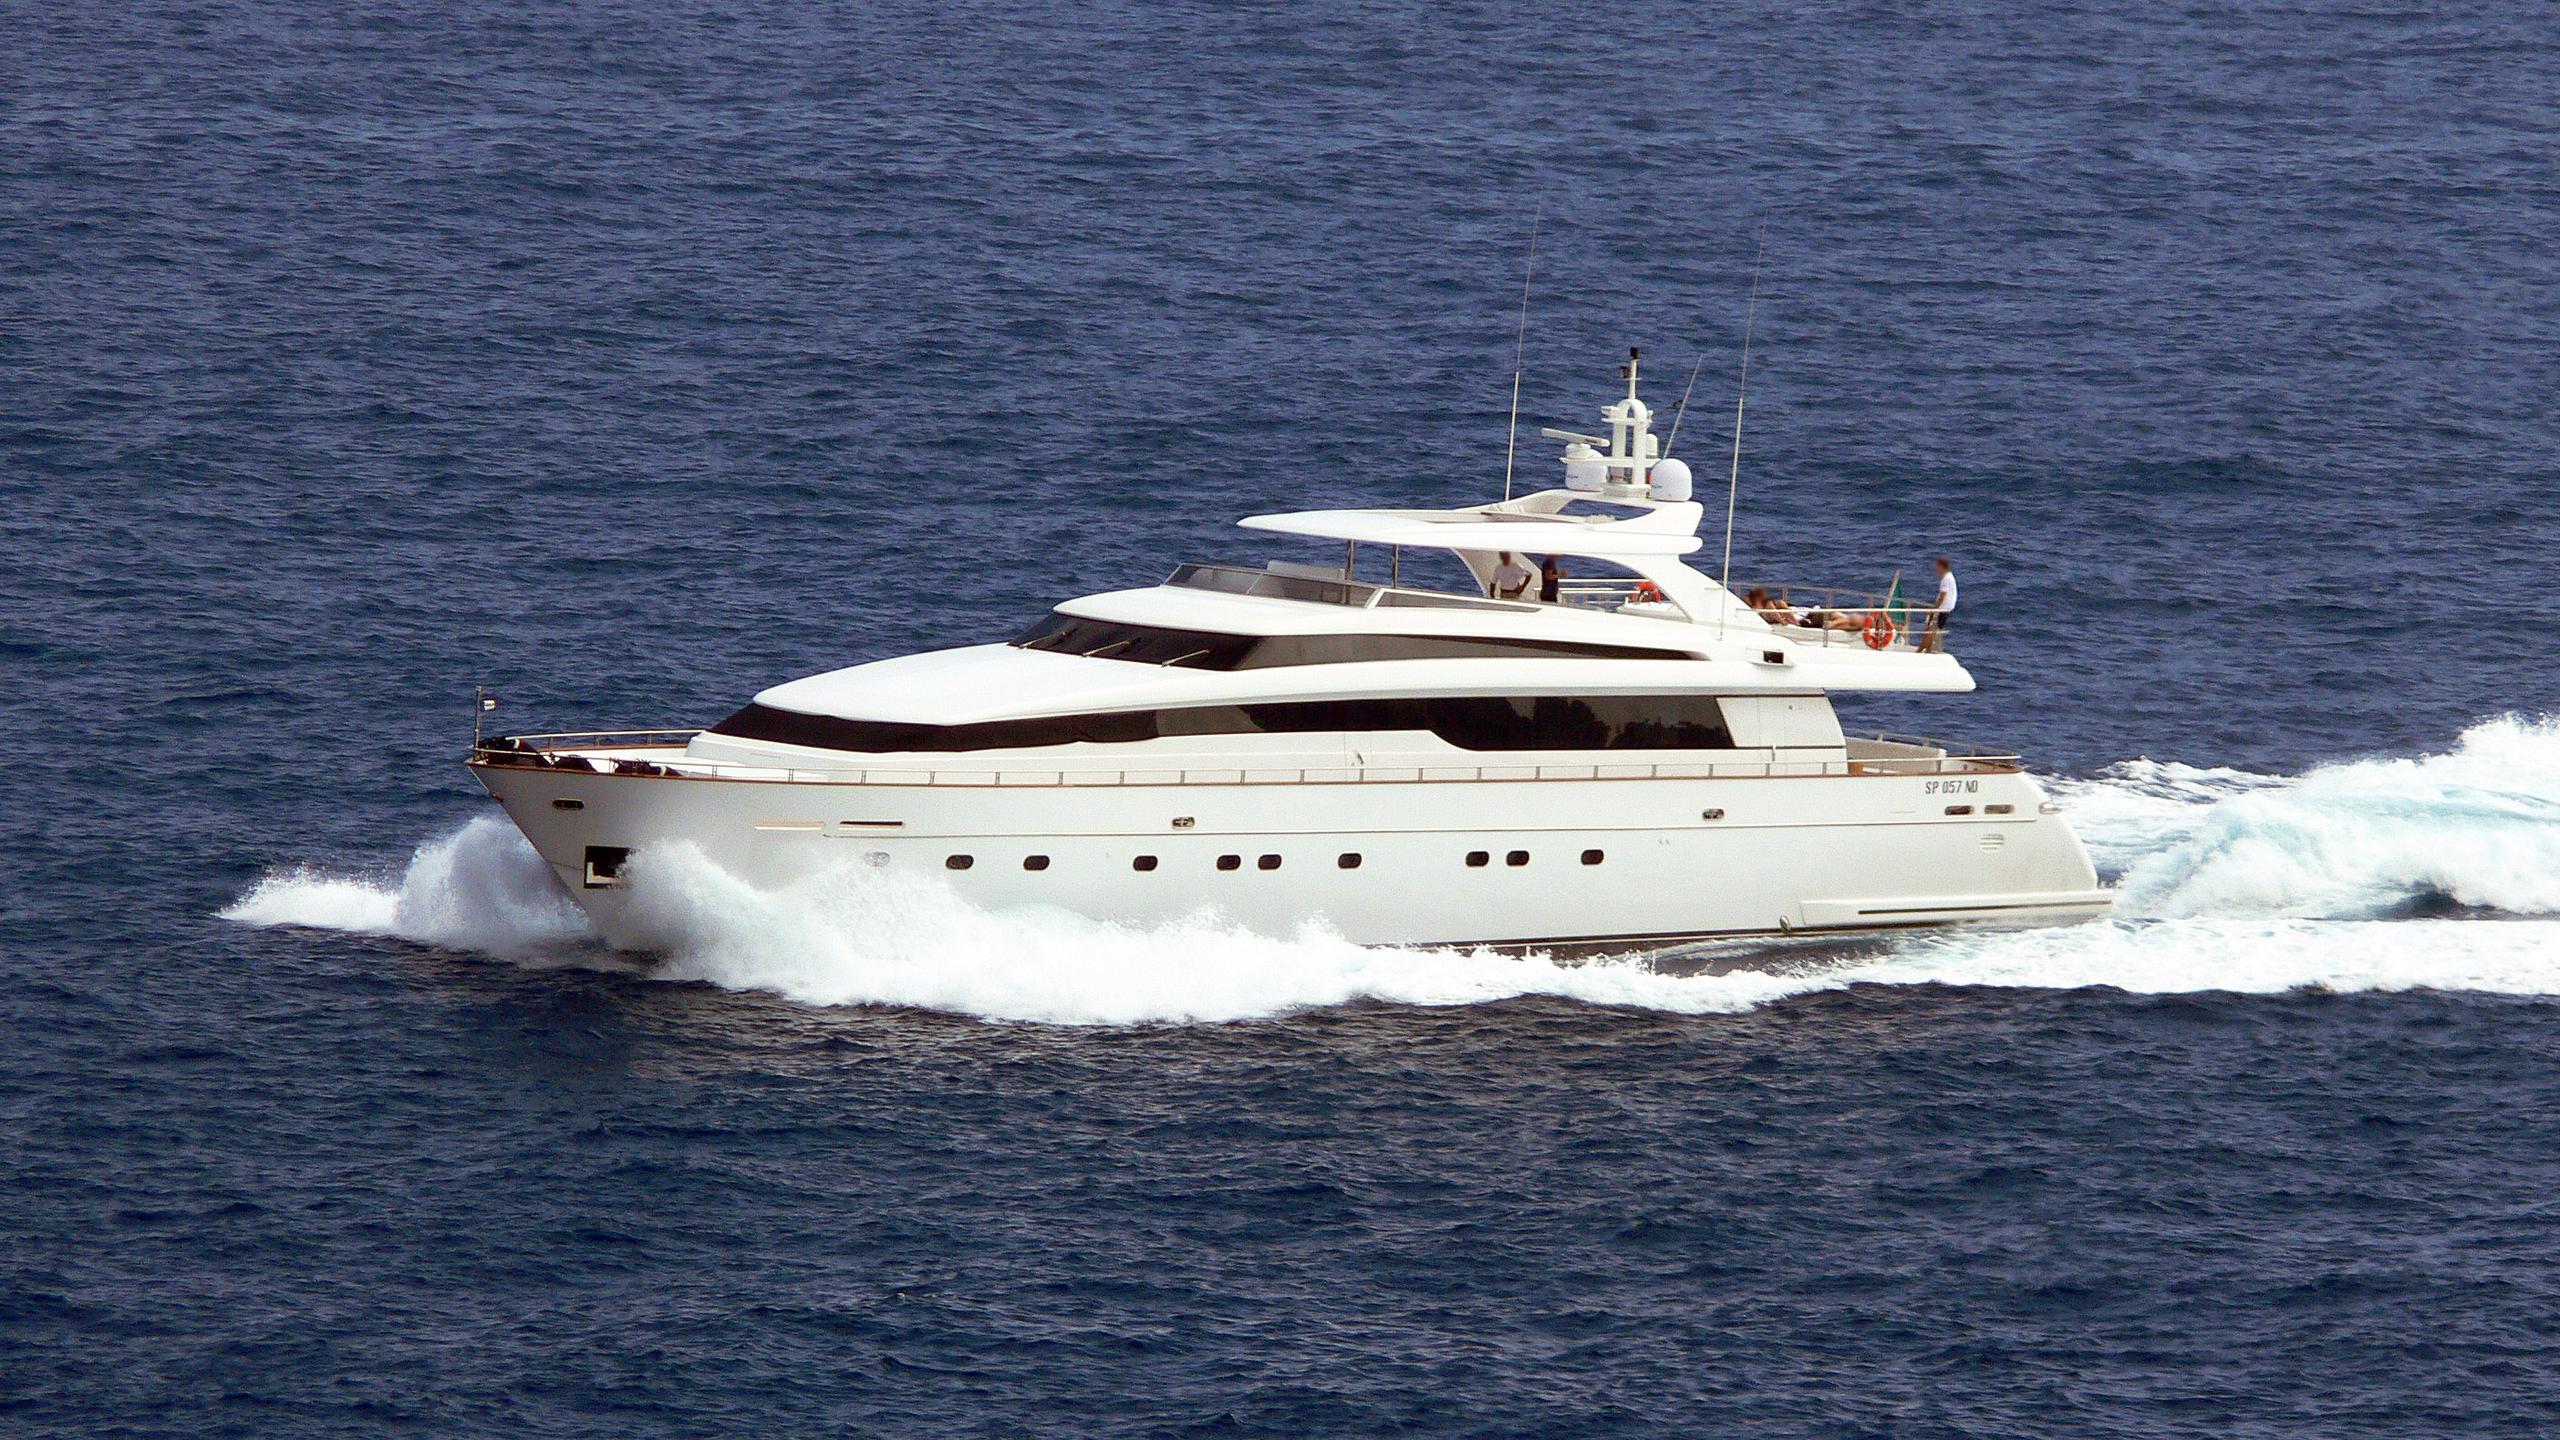 dester-motor-yacht-sanlorenzo-sl-108-2006-33m-cruising-profile